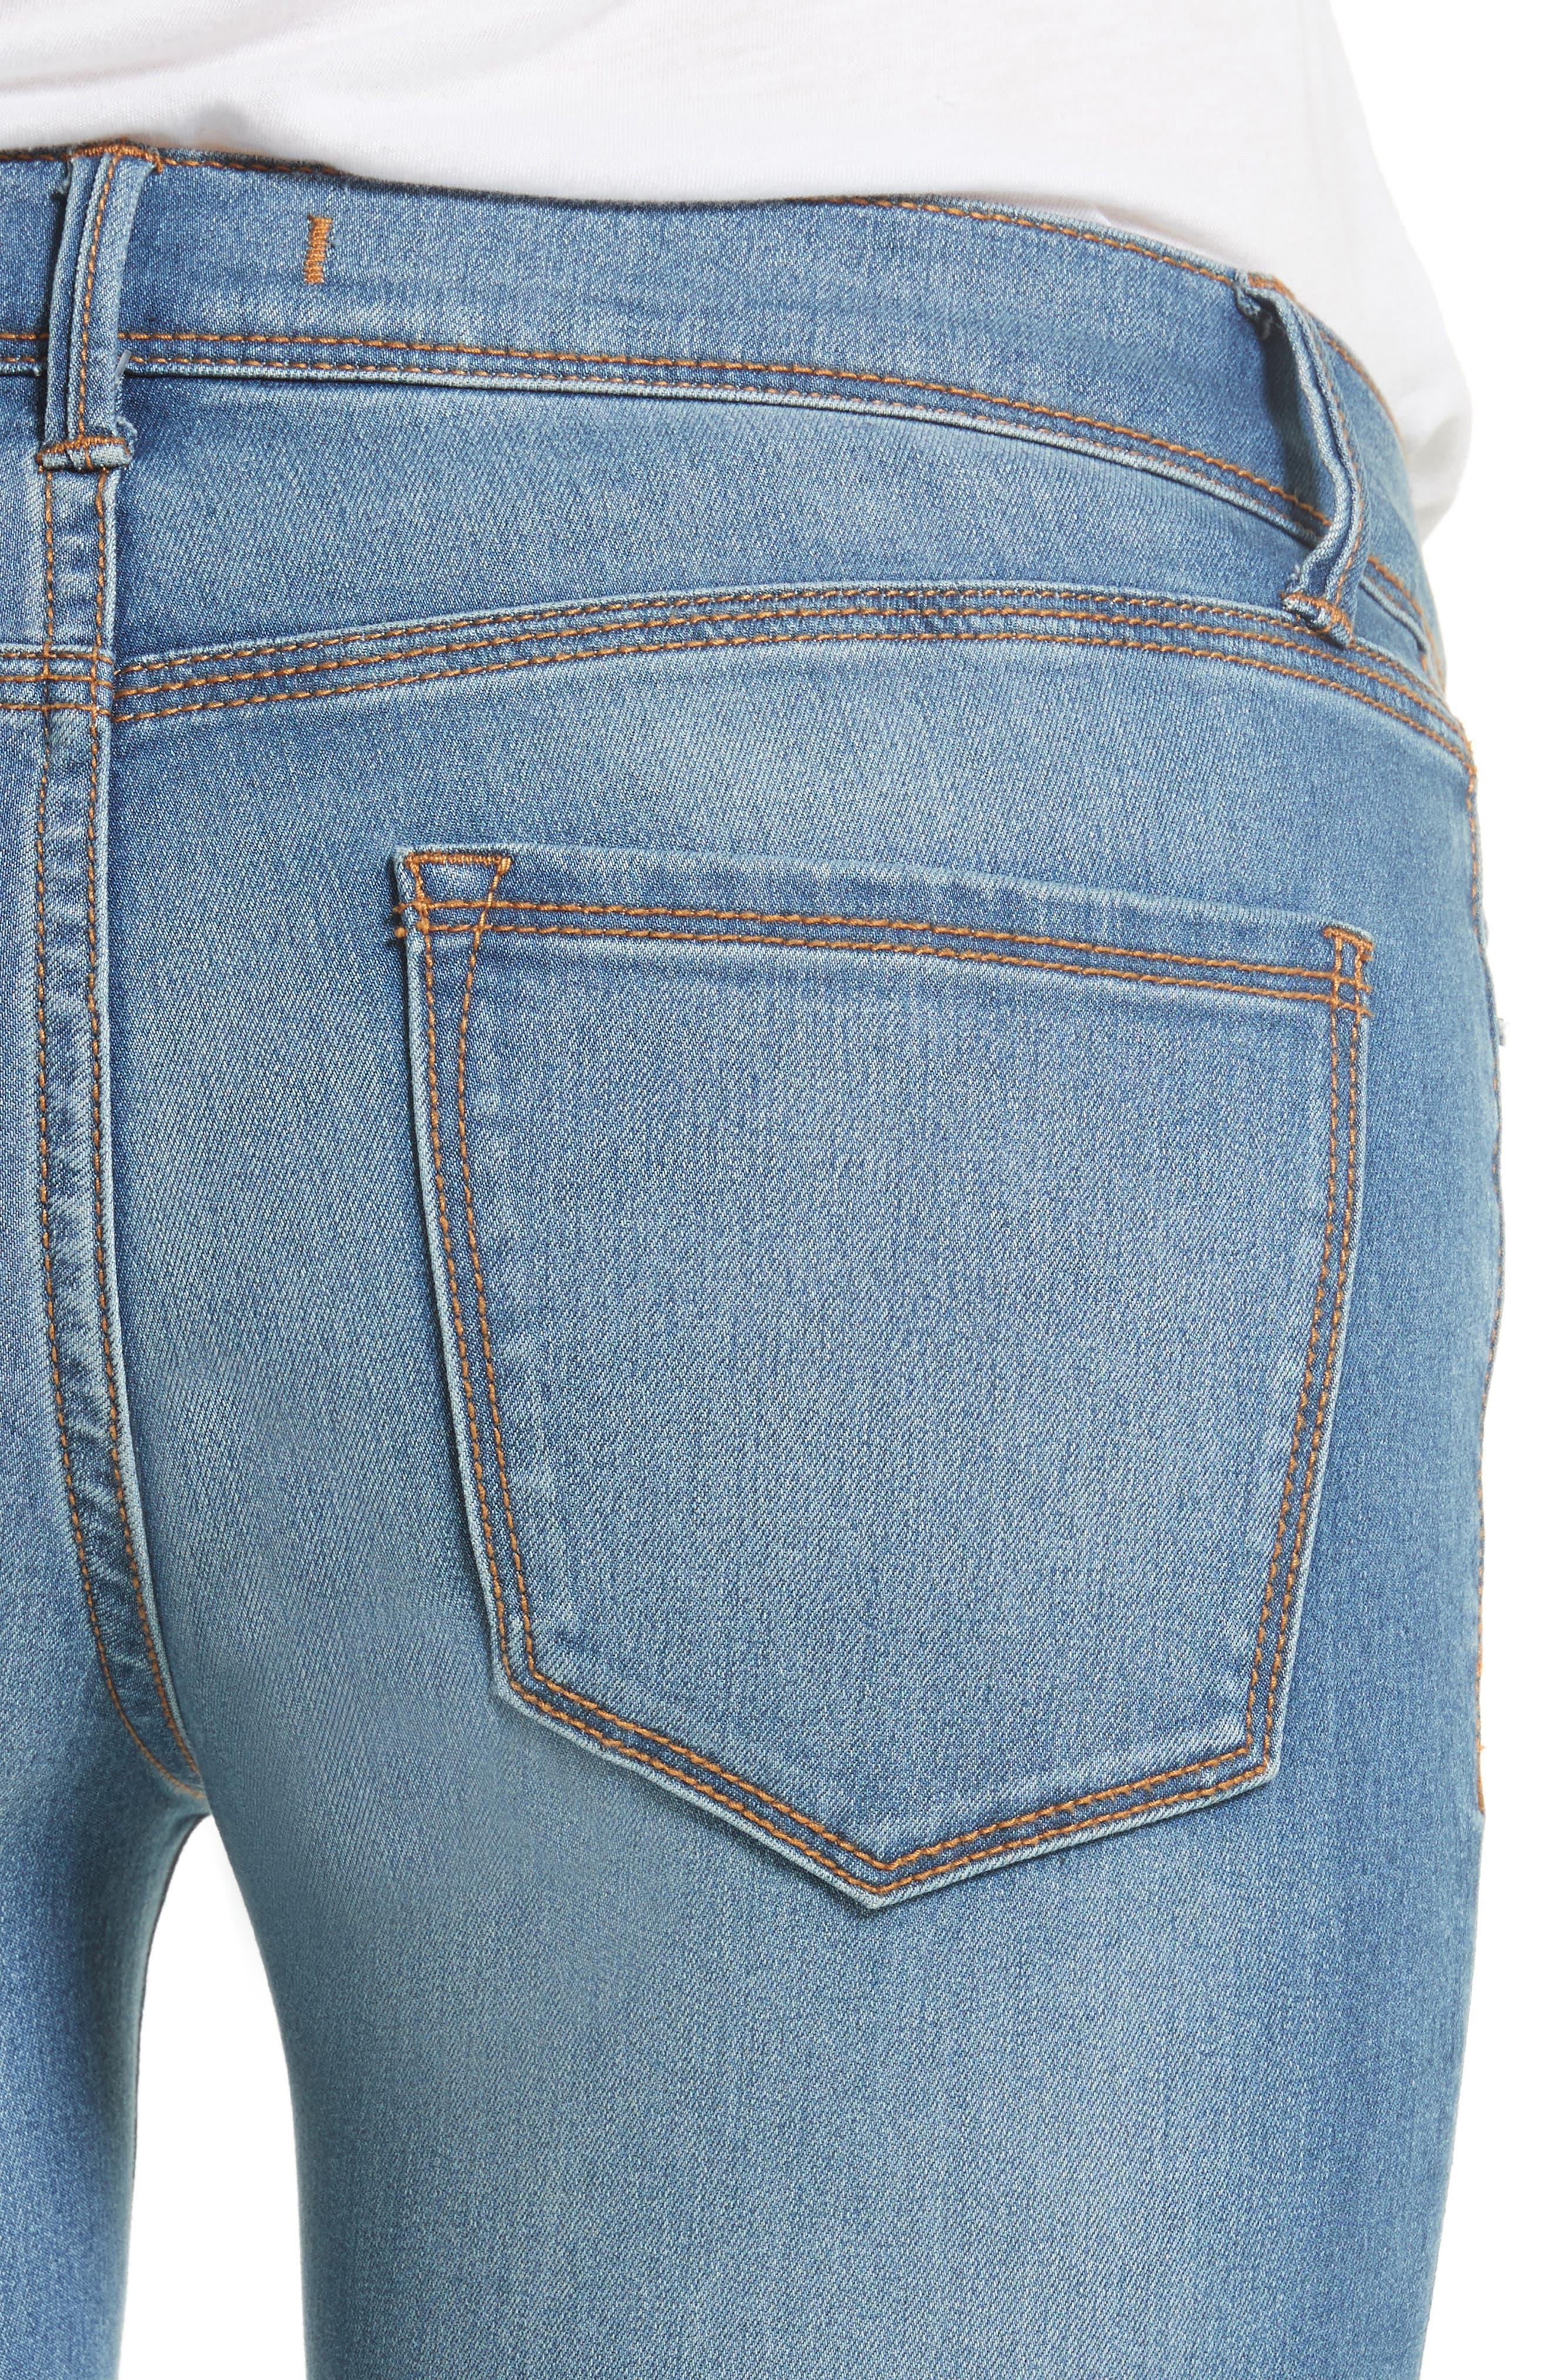 Alternate Image 4  - Free People Gummy High Waist Jeans